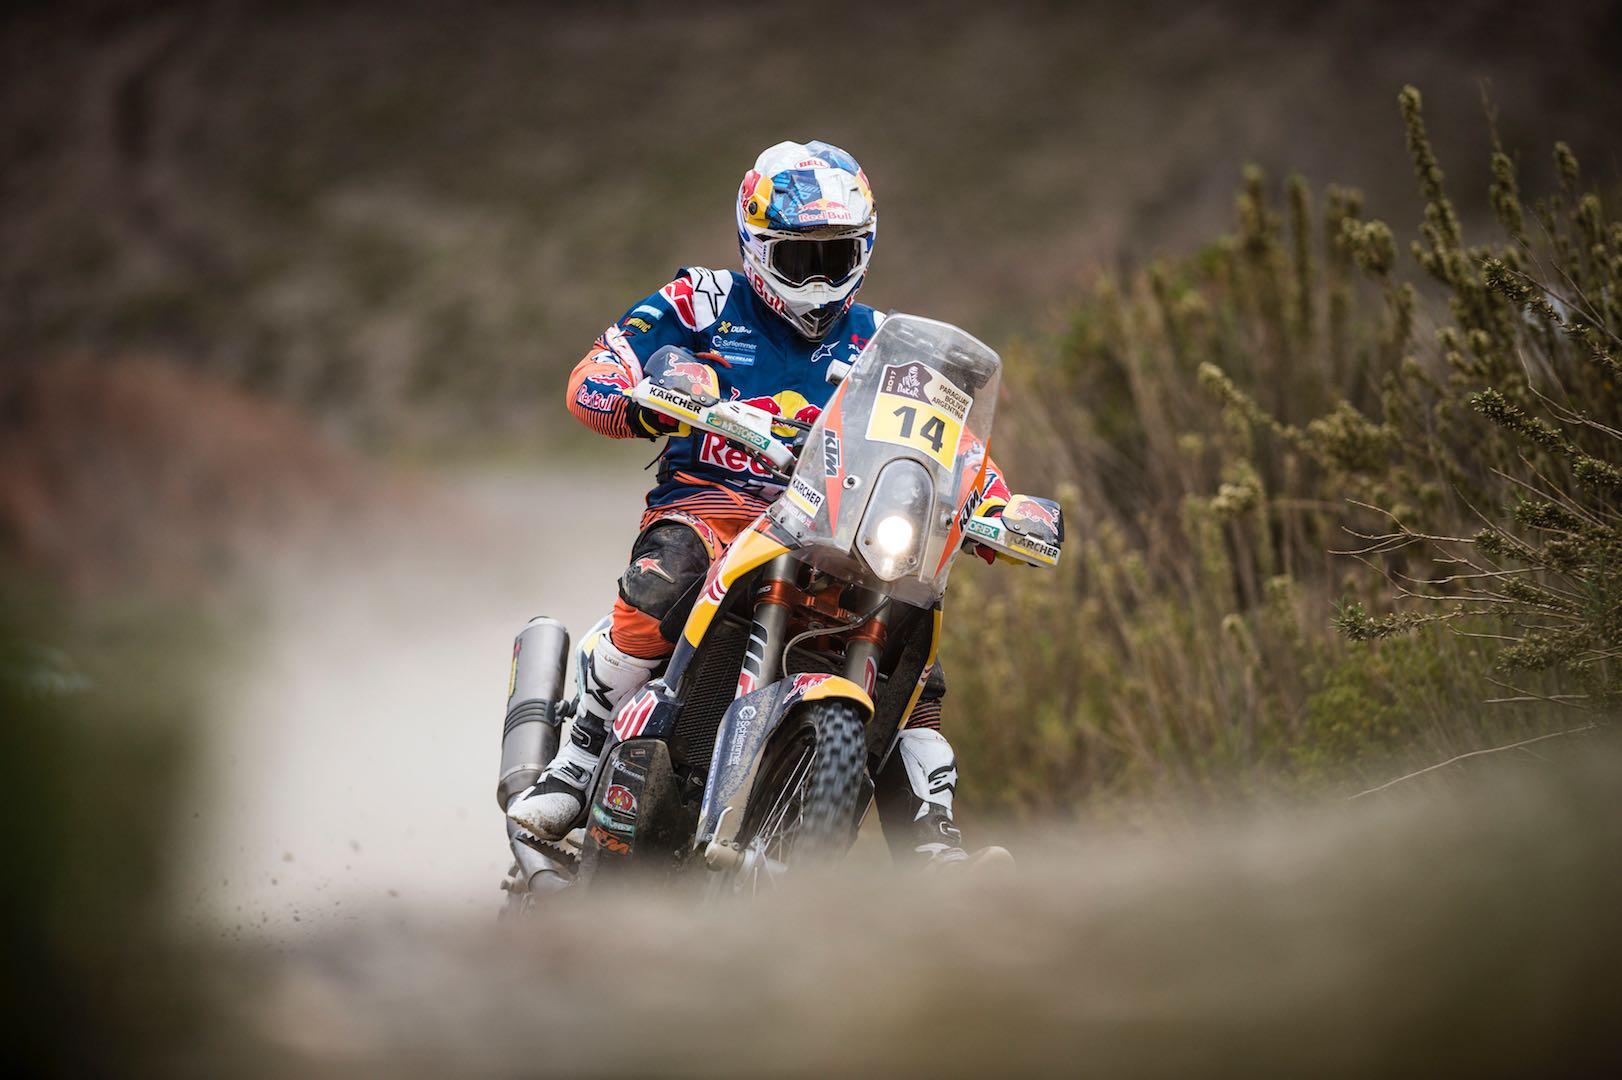 2017 Dakar Rally Stage 5, Motorcycles: KTM's Sunderland's Turn